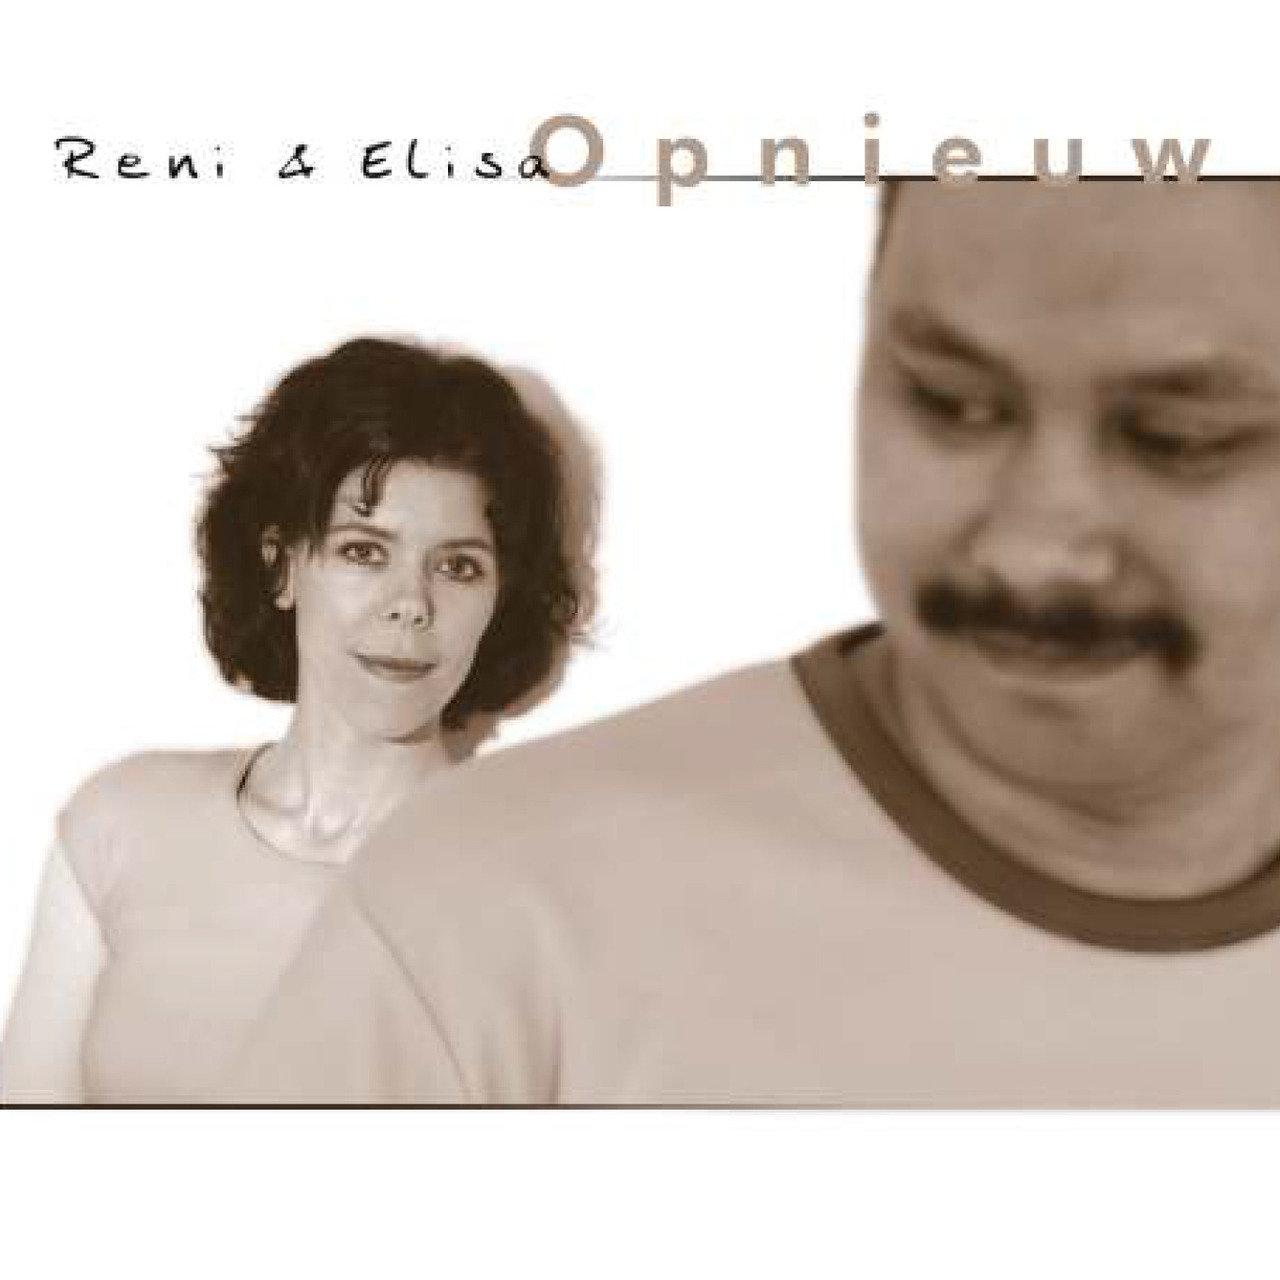 Reni & Elisa Opnieuw